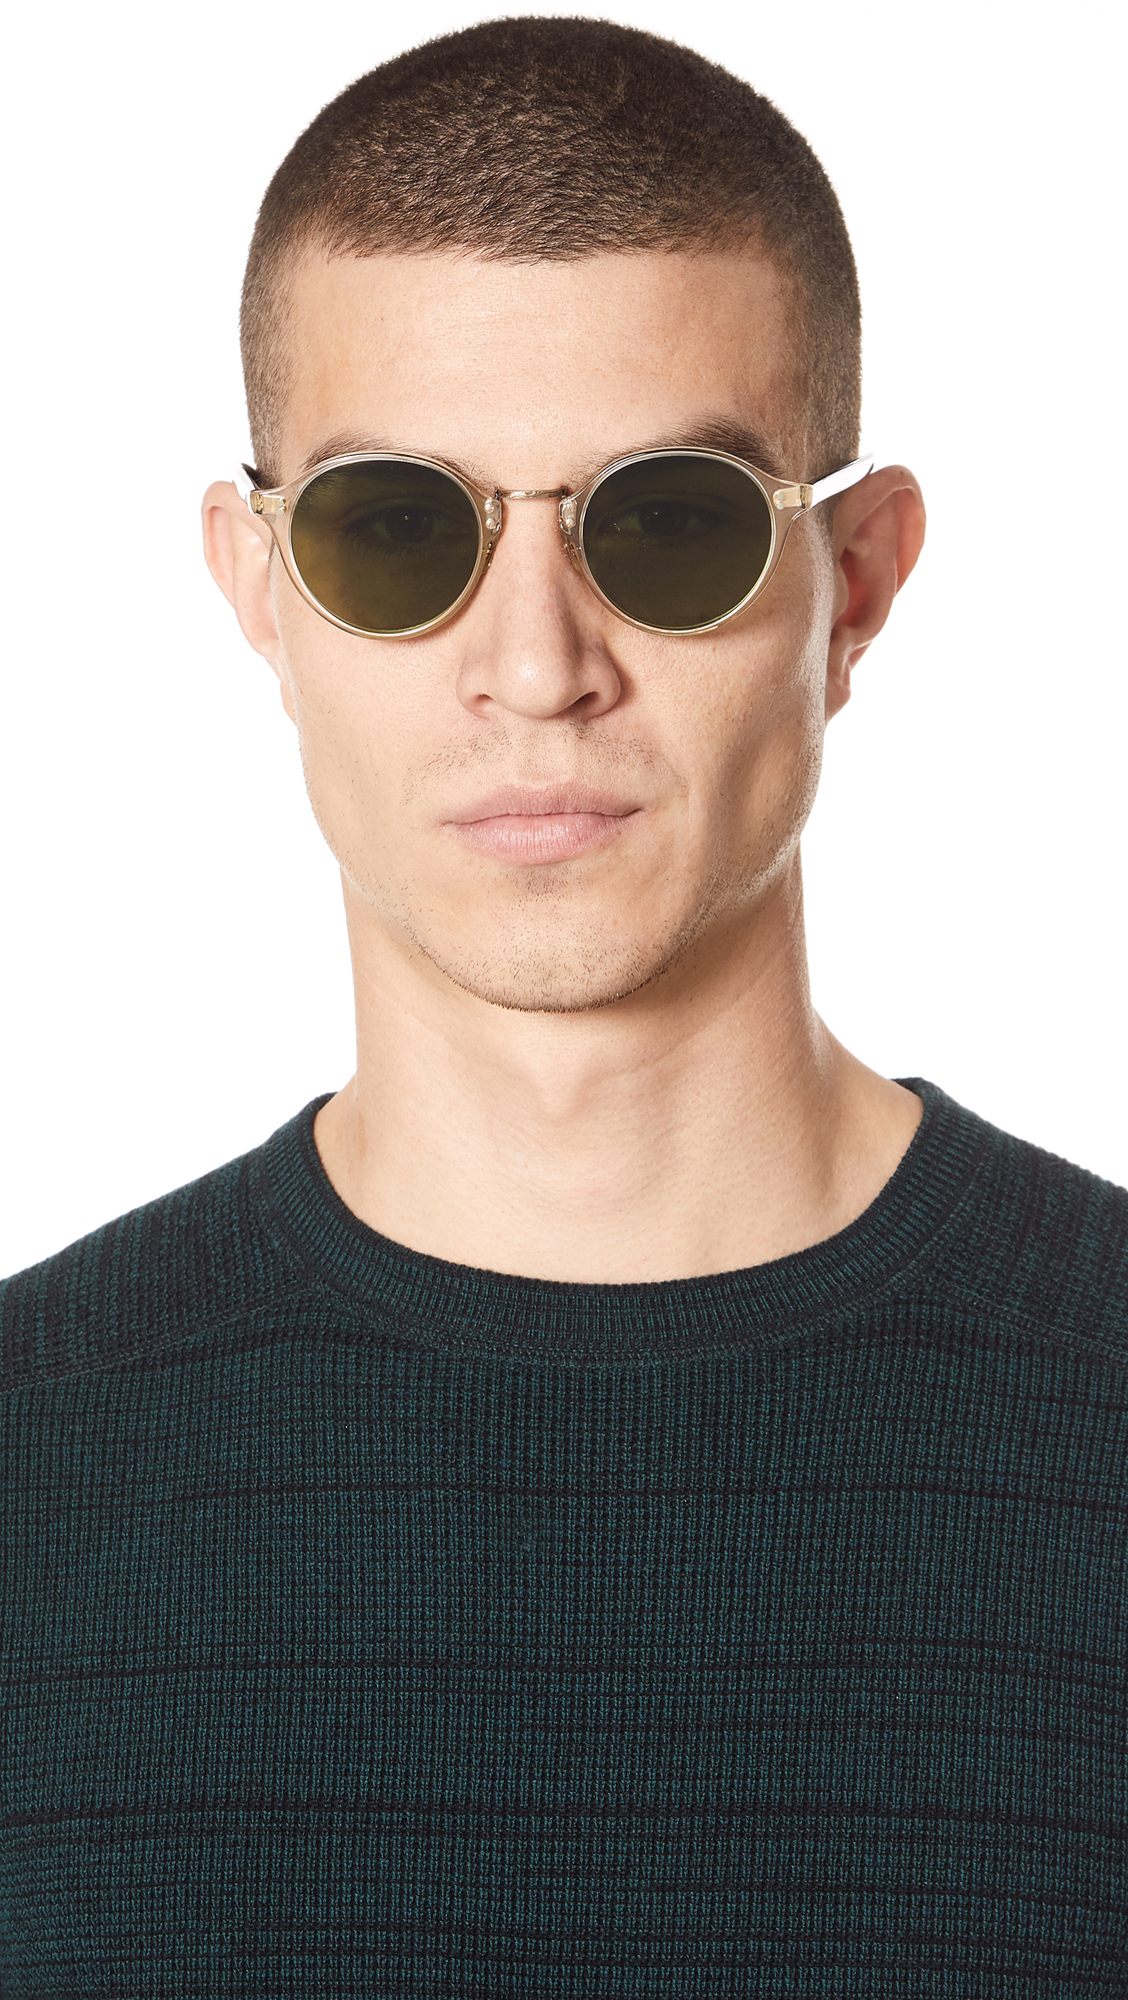 ad658bac9e2 Oliver Peoples Eyewear OP 1955 Sunglasses